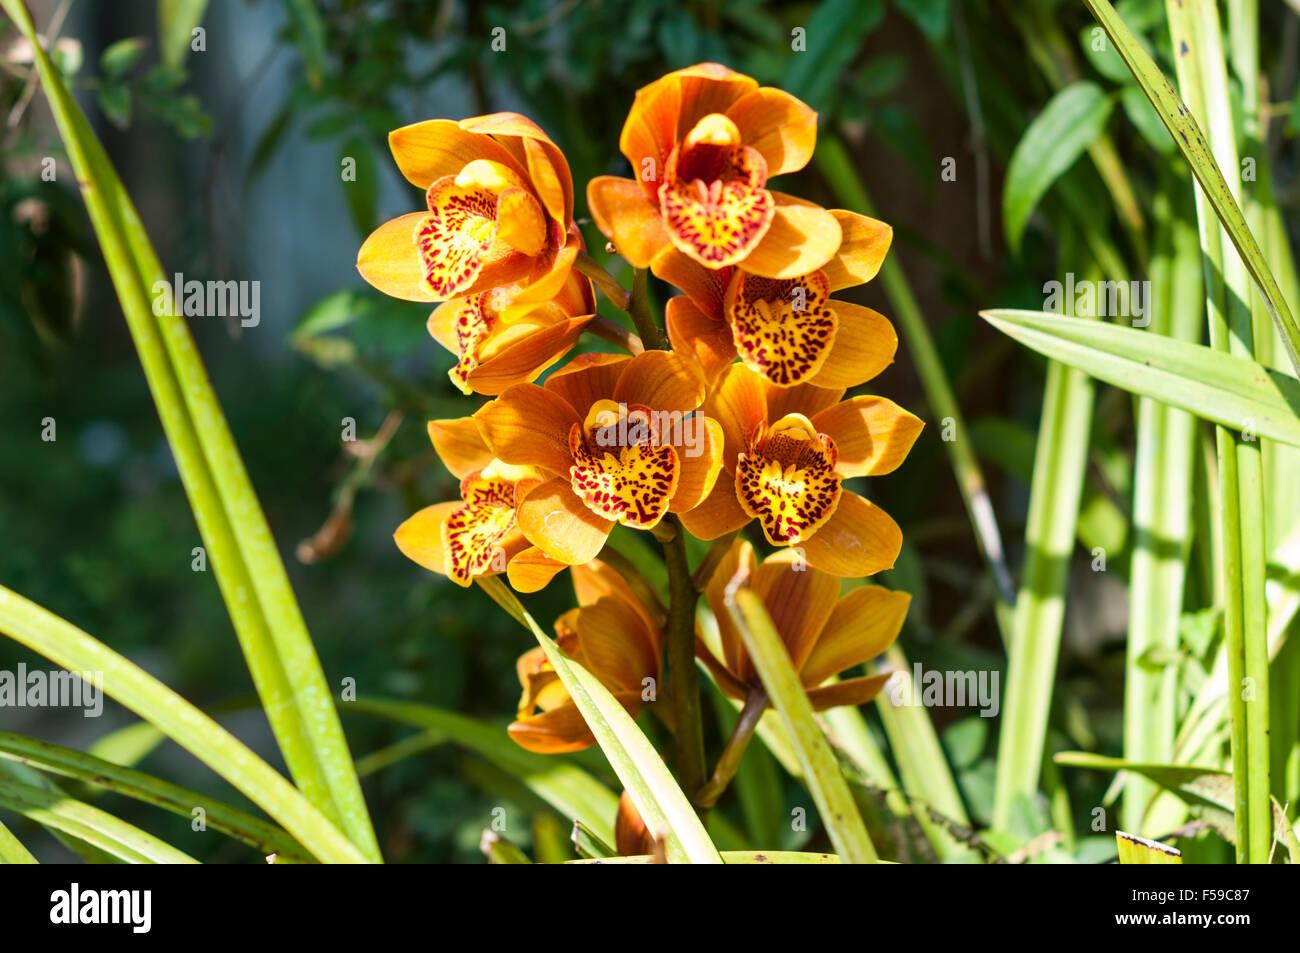 Phalaenopsis orchid in the National Kandawgyi Botanical Gardens of Pyin Oo Lwin (Maymyo), Mandalay Region, Myanmar. Stock Photo